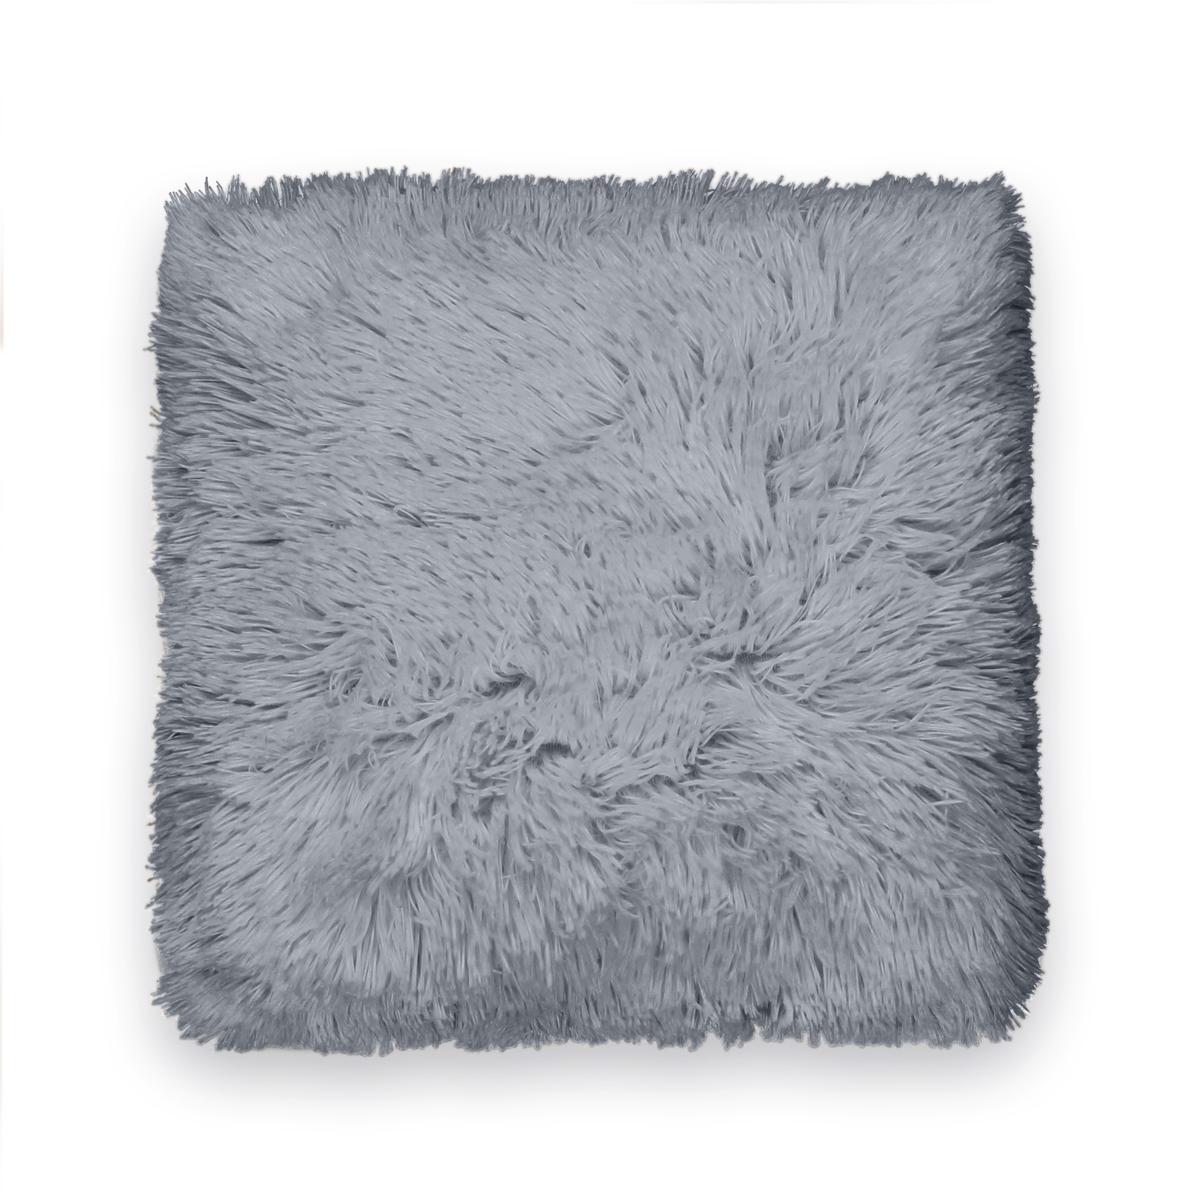 Чехол La Redoute Для подушки DOUDOUX 40 x 40 см серый чехол для подушки из шерсти osia